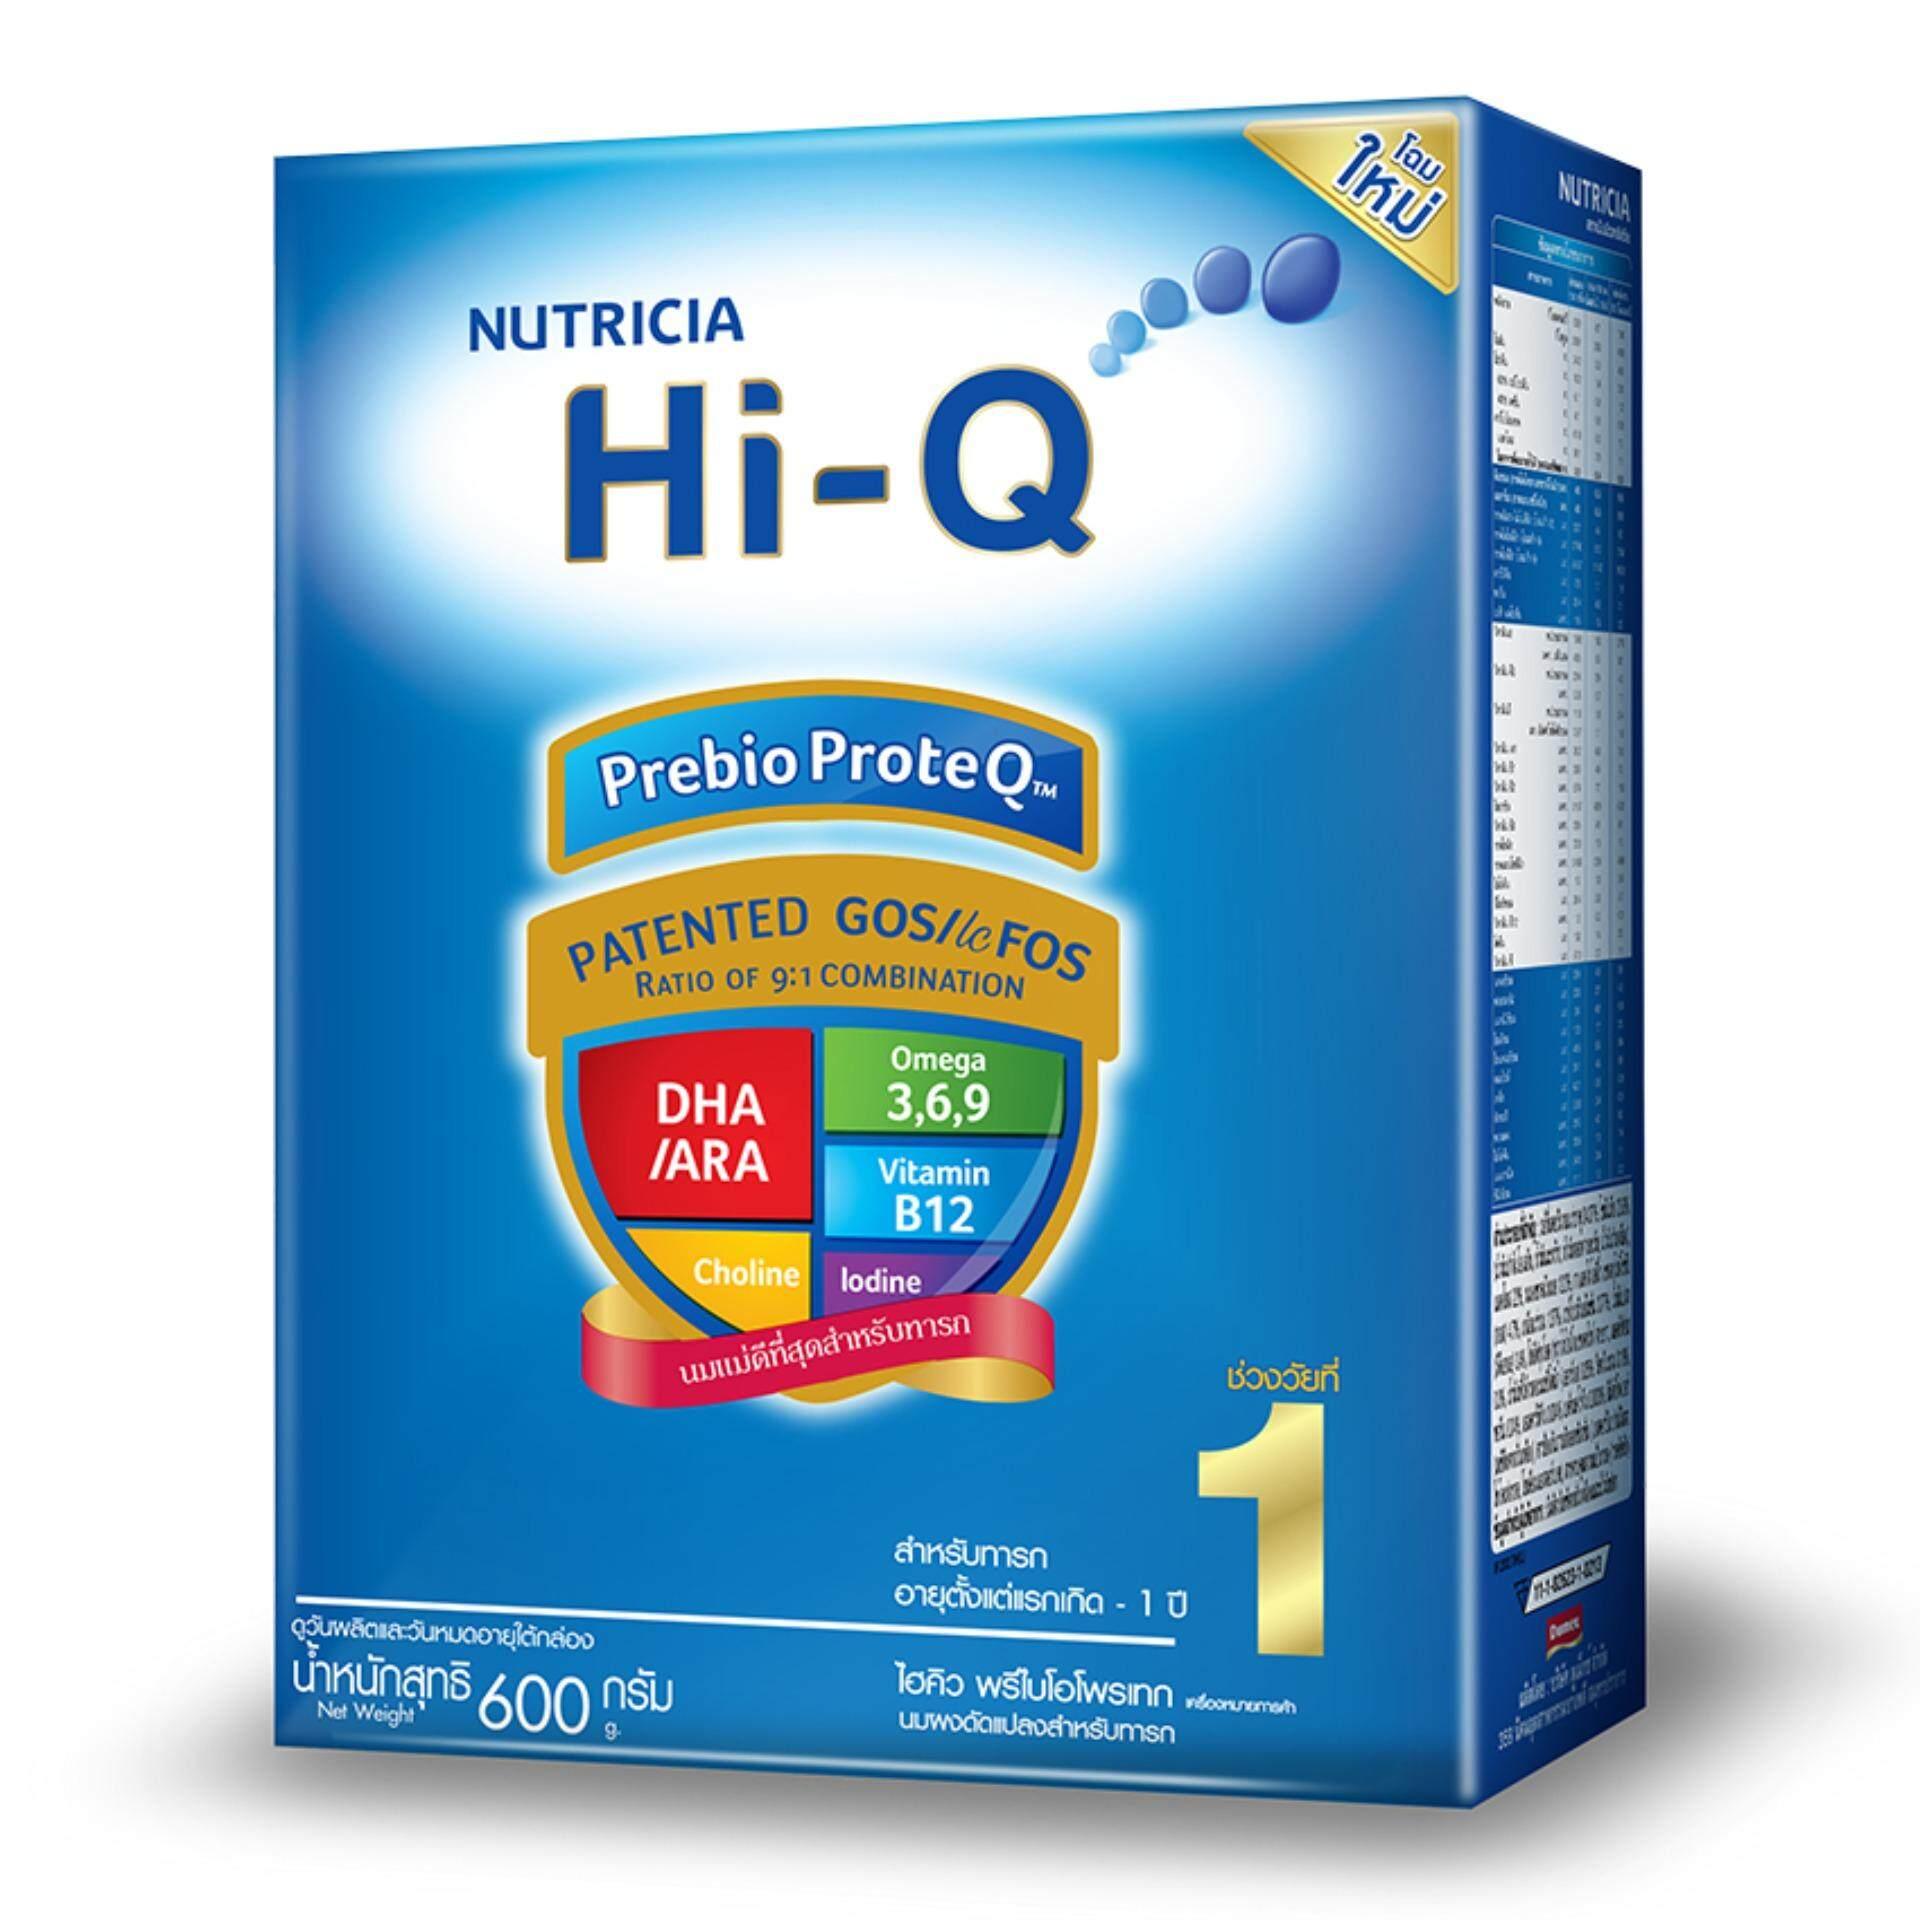 HI-Q ไฮคิว นมผง พรีไบโอโบรเทก ช่วงวัยที่ 1 รสจืด 600 กรัม